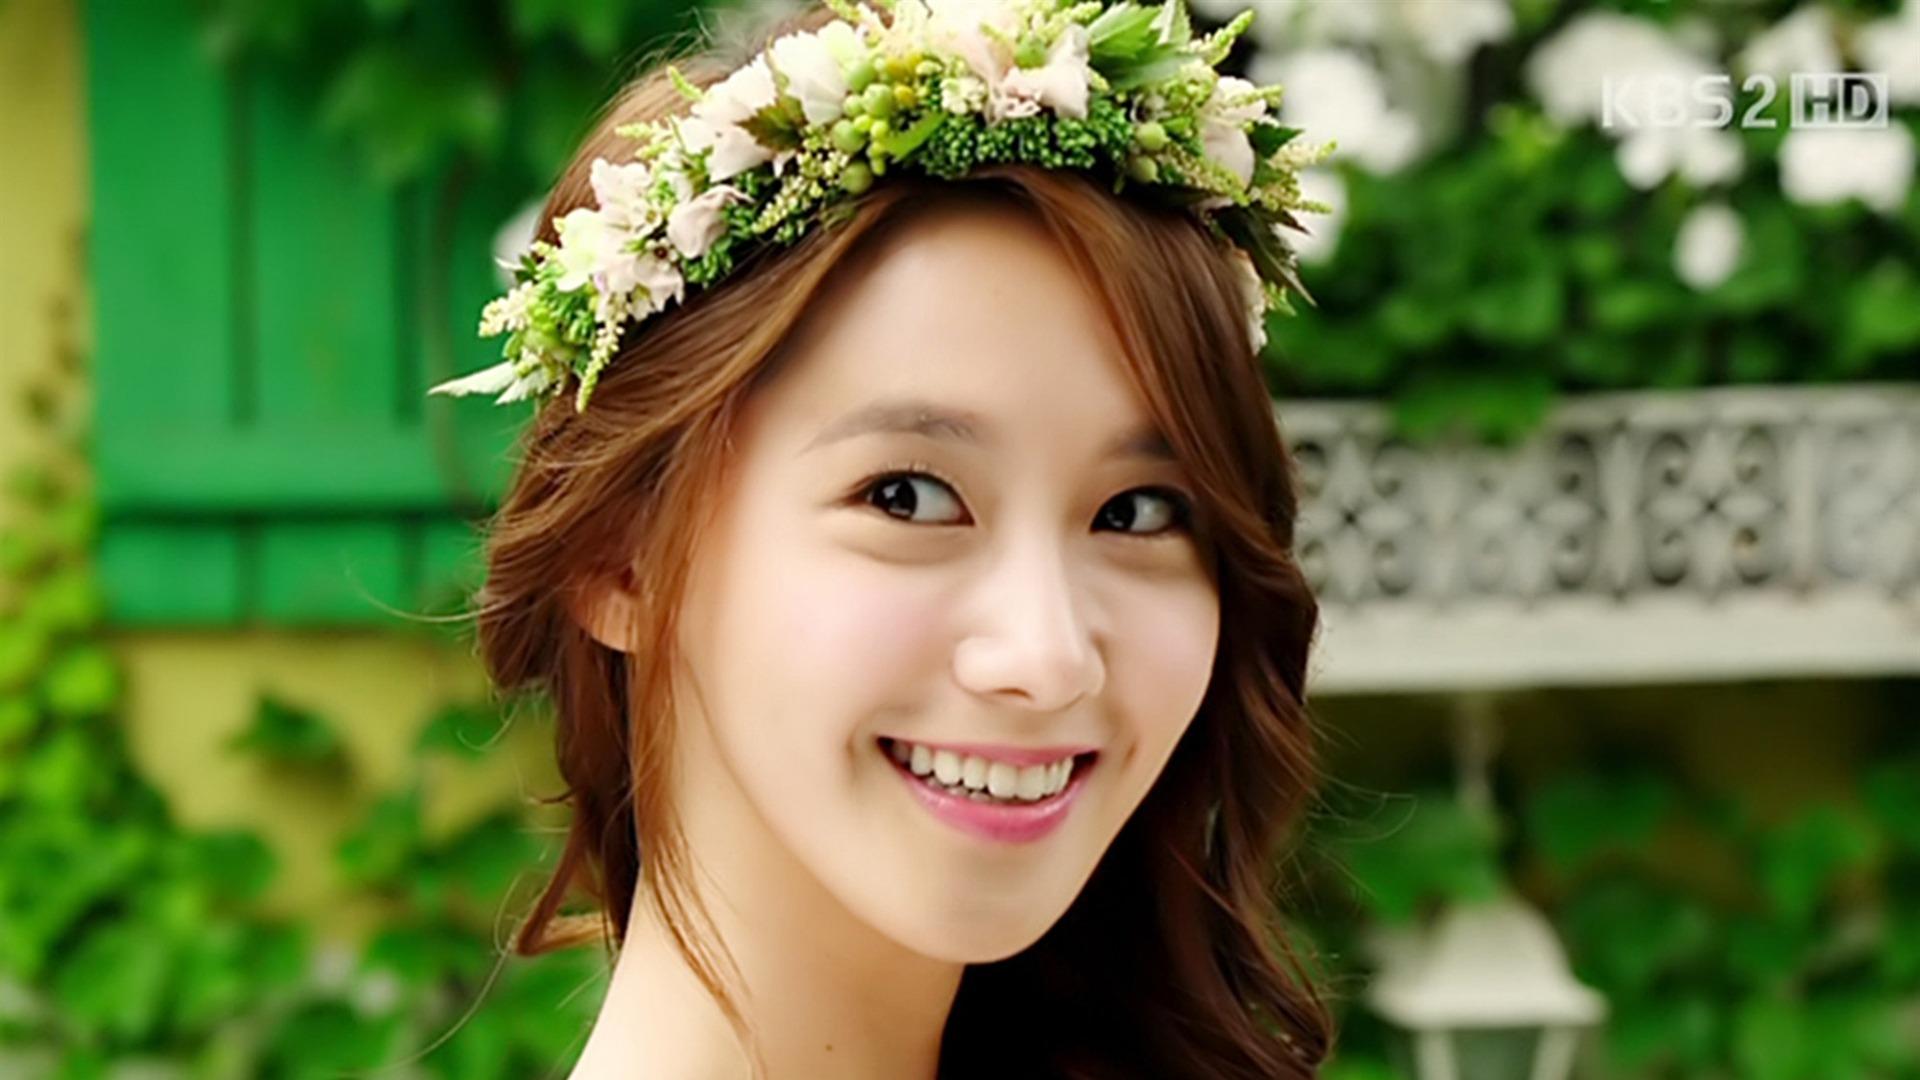 Yoona Korean Girls Generation HD Photo Wallpaper Preview